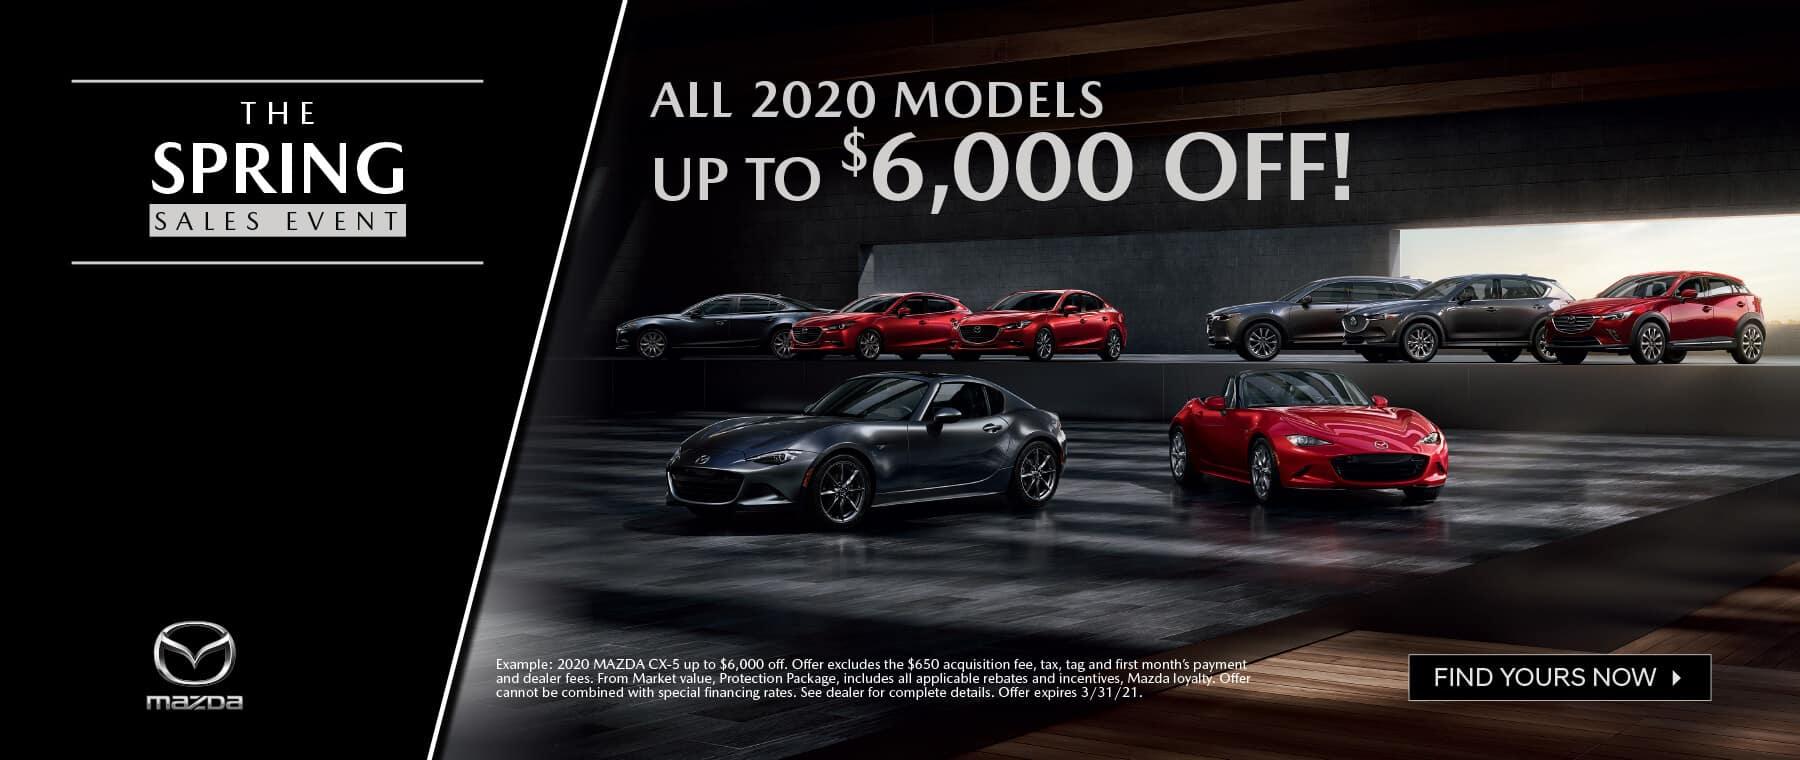 2021.02.24-Keffer-Mazda-MAR-Web-Banners-S51082vw-2